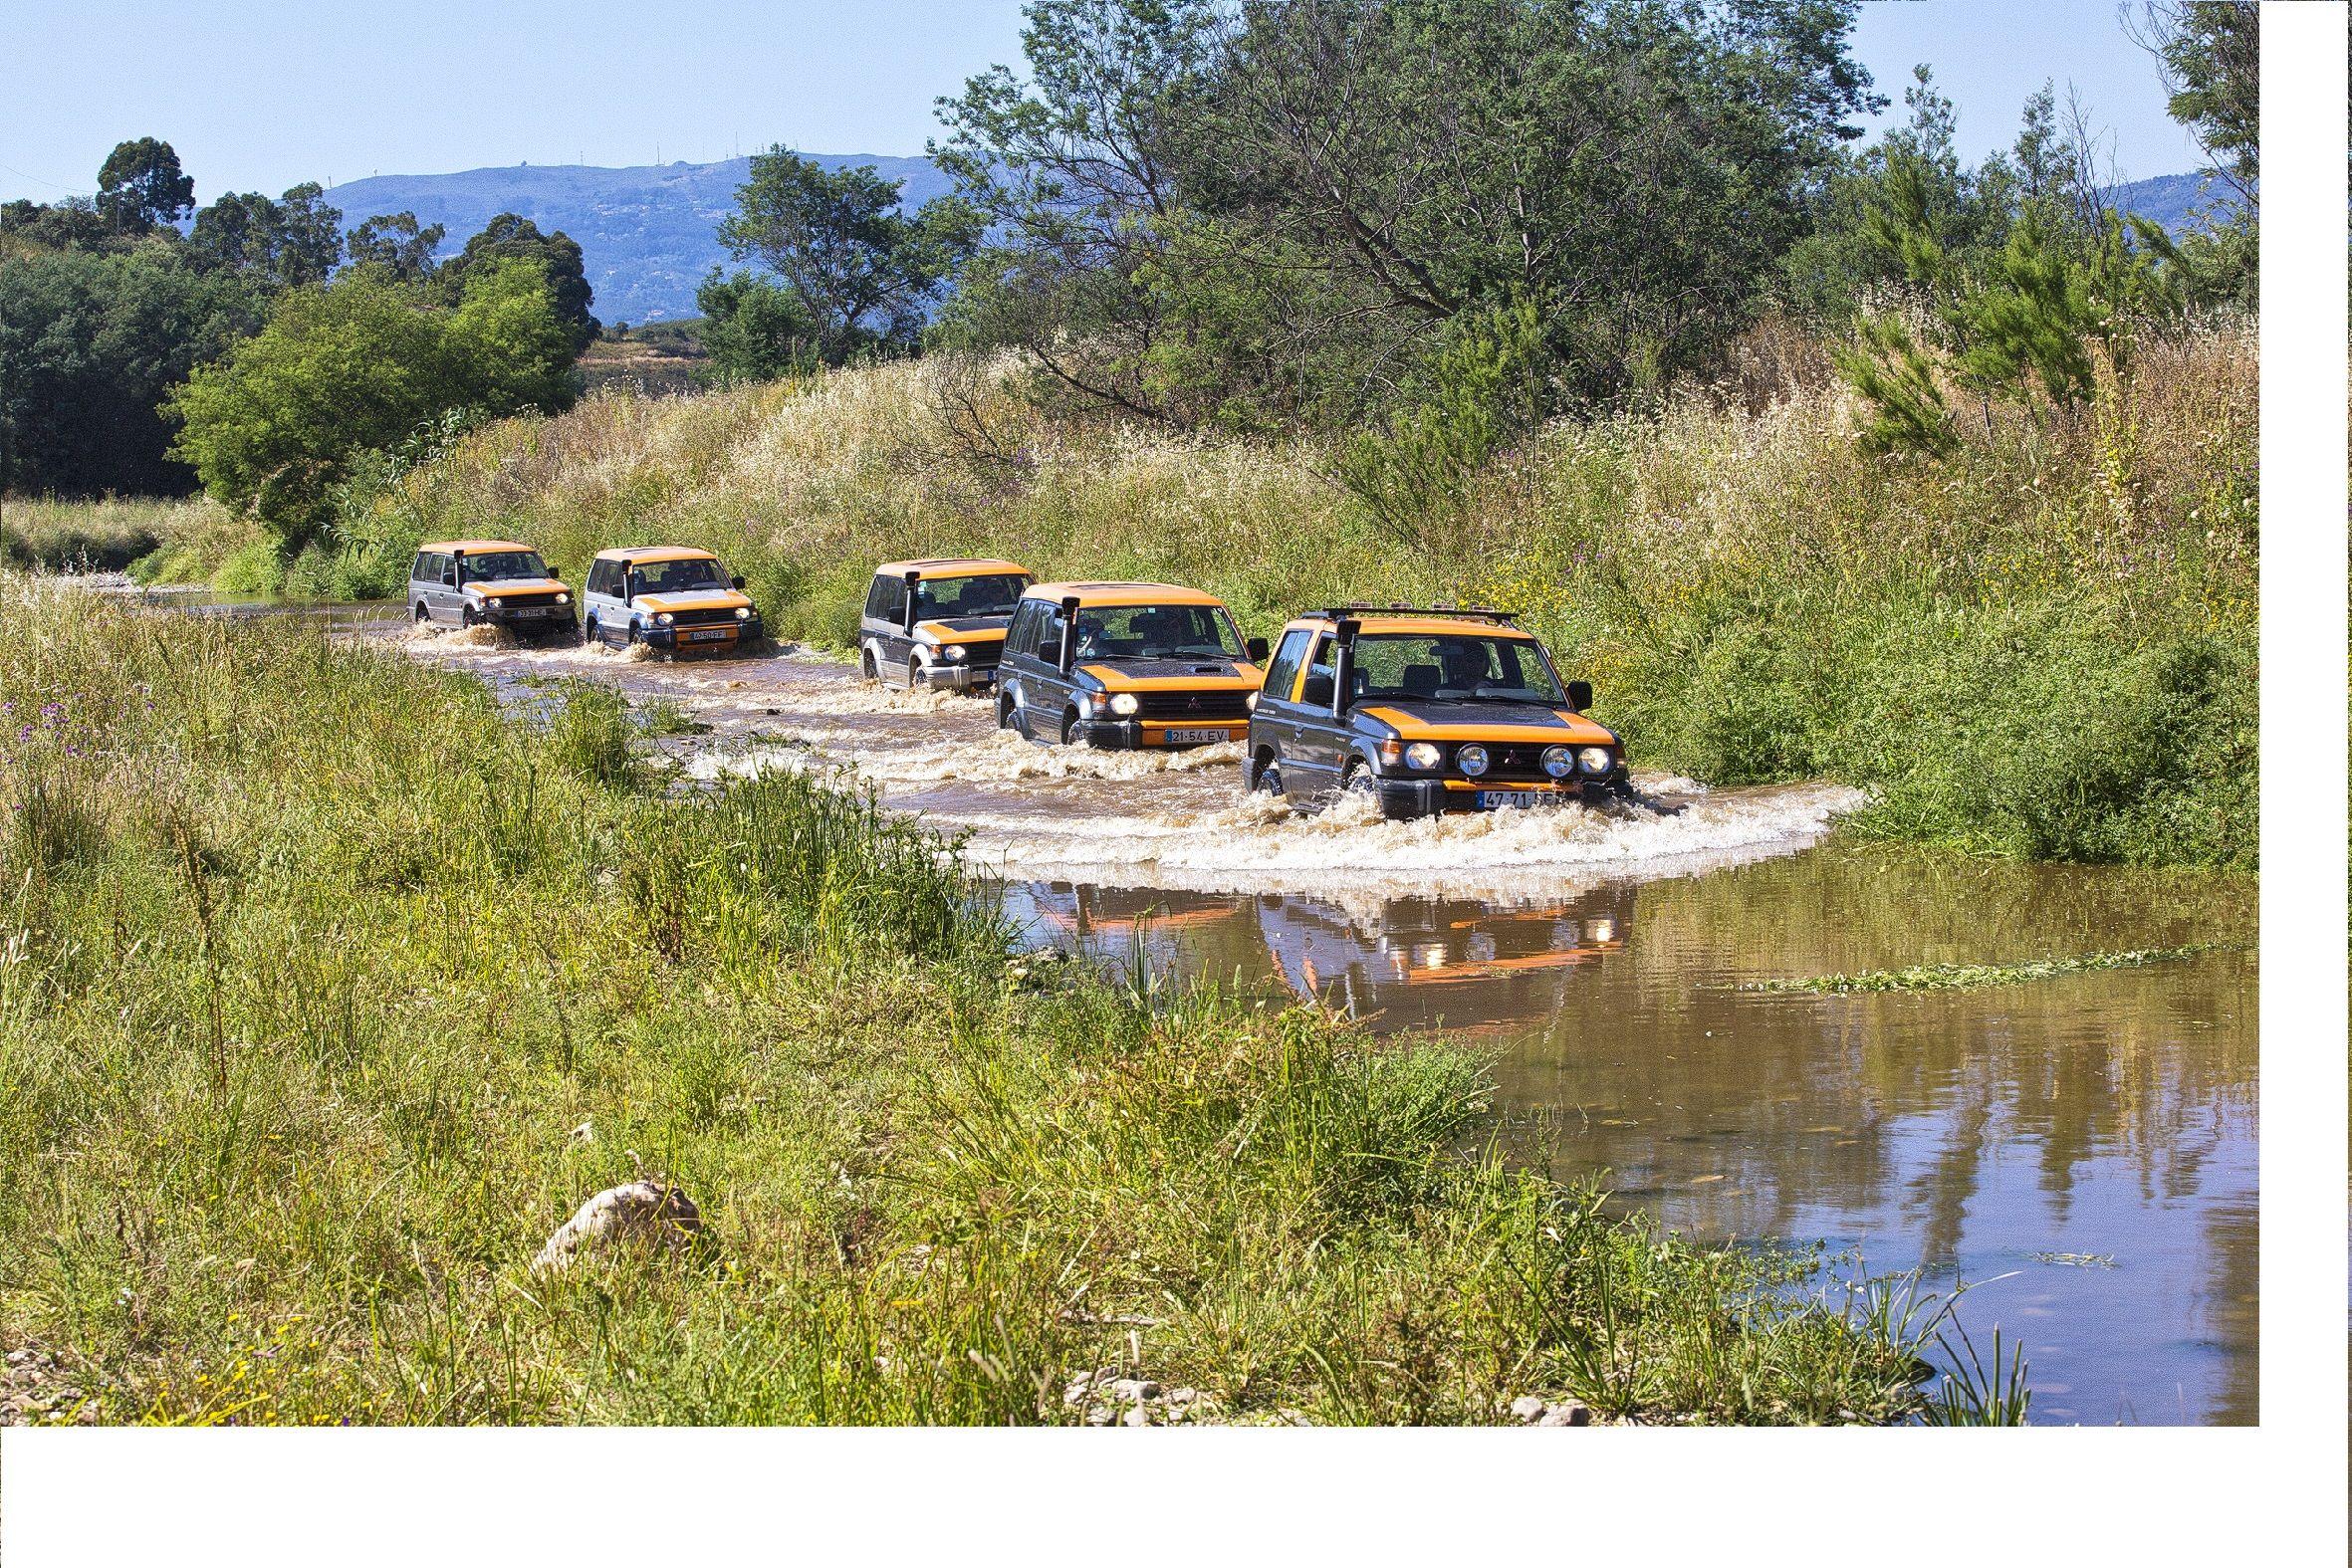 Algarve Jeep Safari Tours In 2020 Safari Tour Boat Tours Algarve